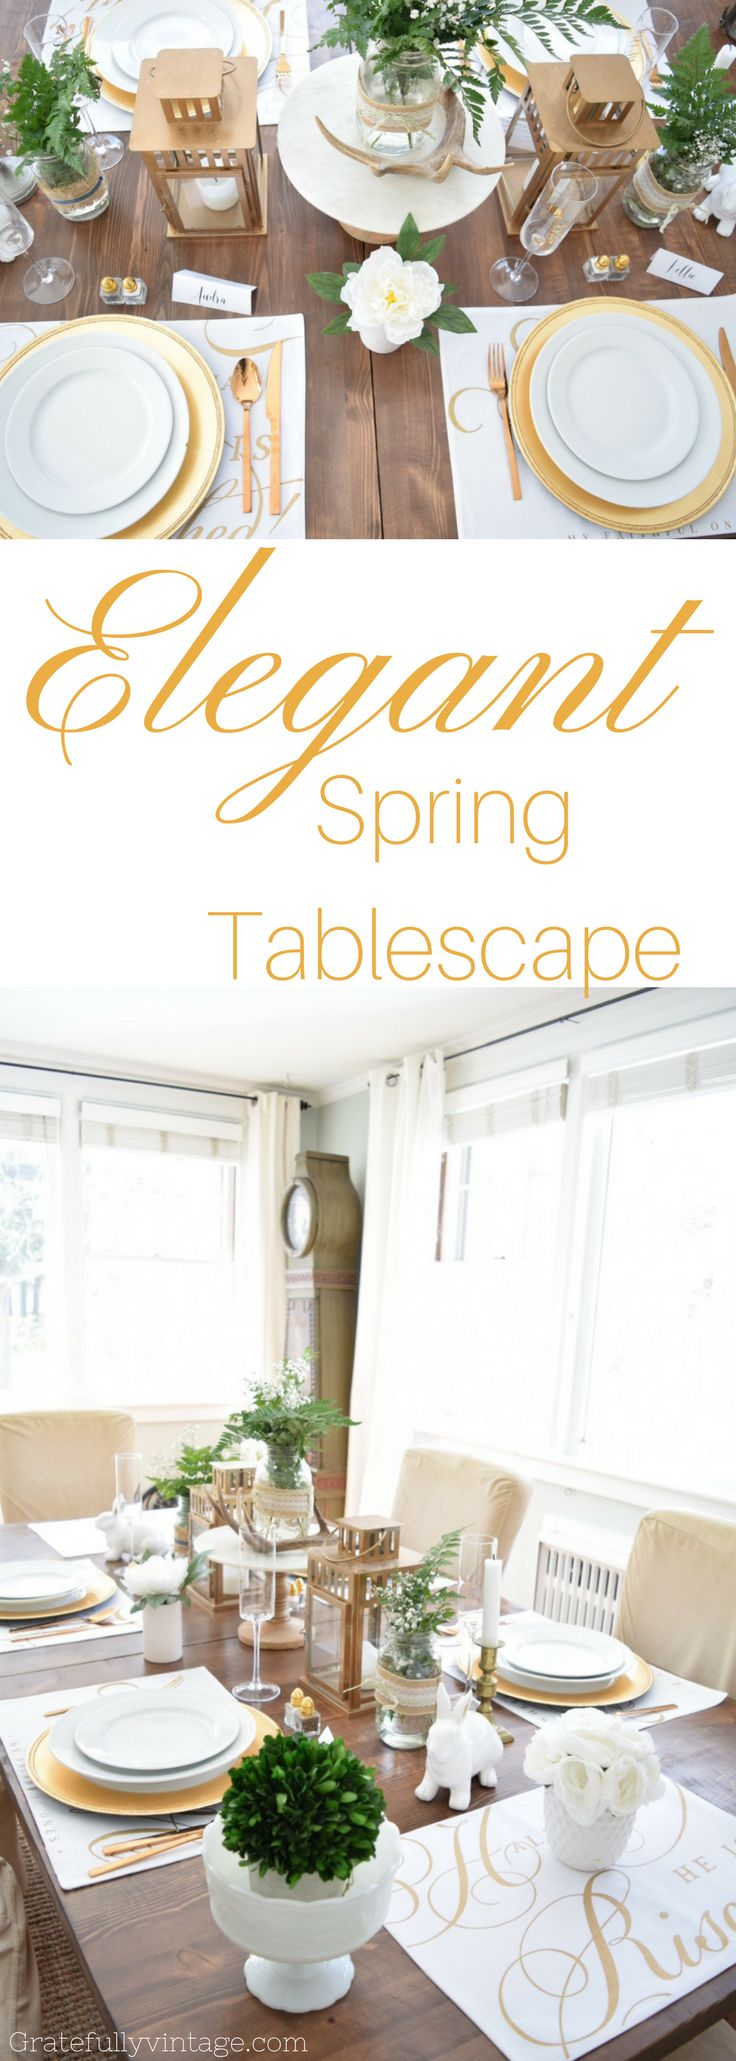 Elegant-Spring-Tablescape-PIN